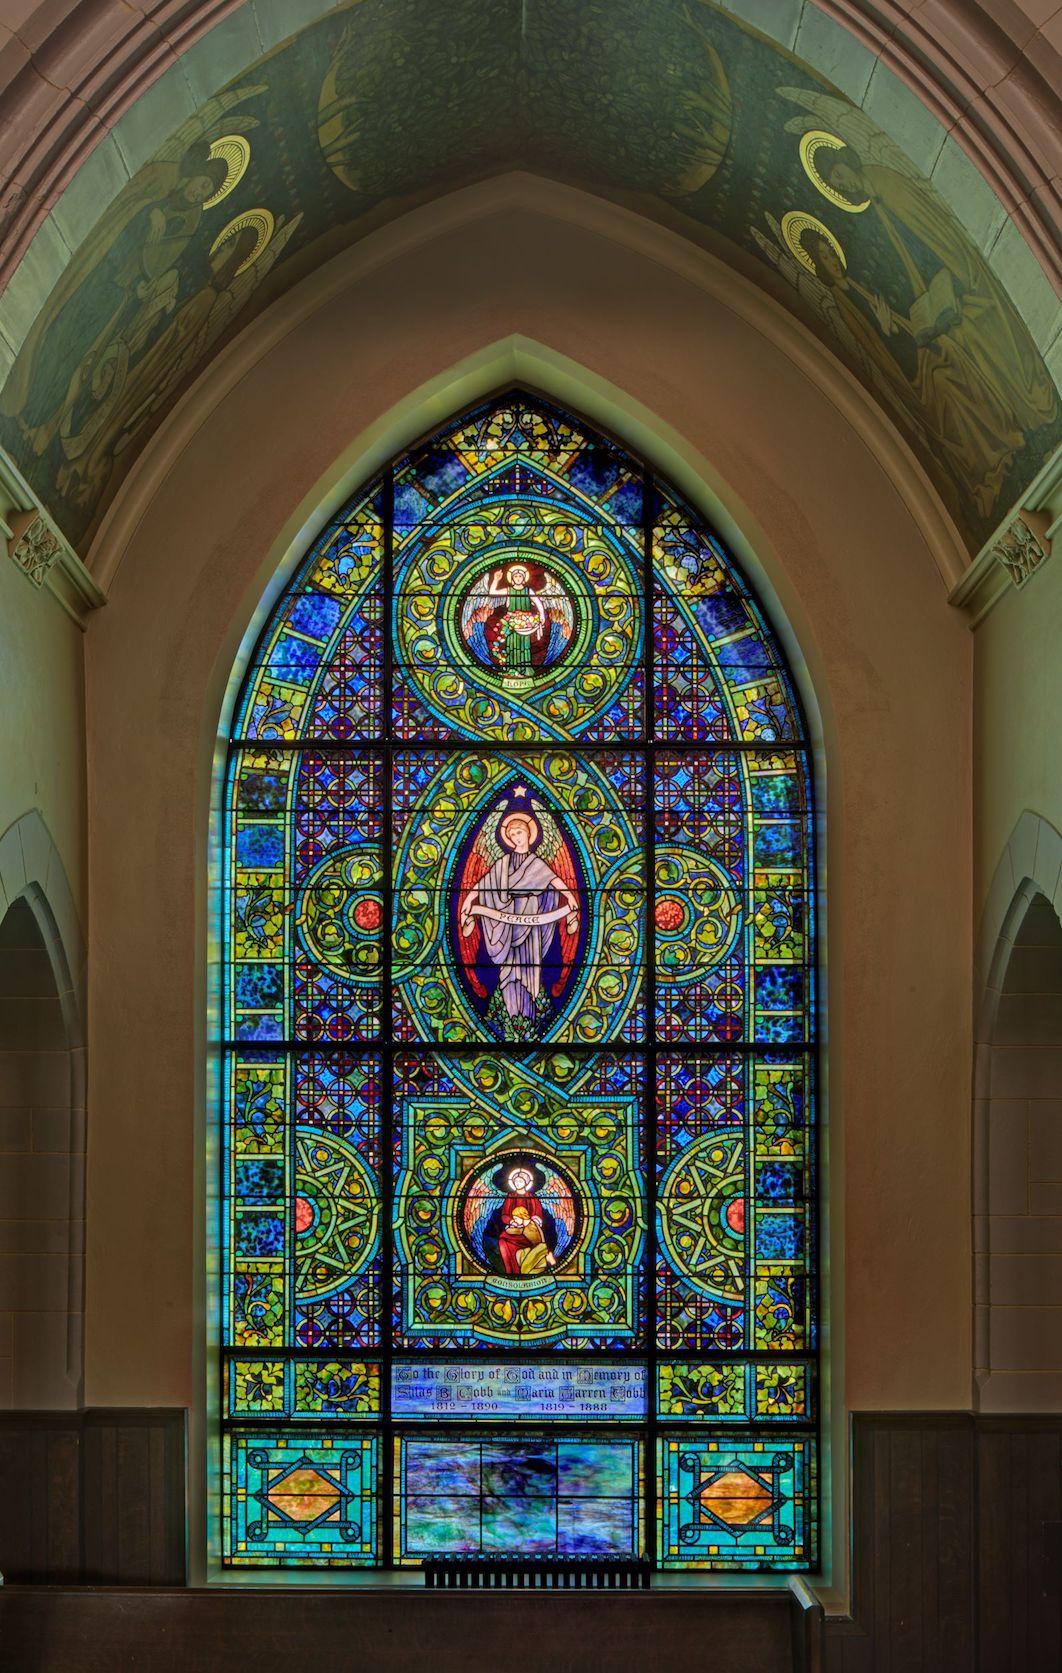 Restored 1903 Tiffany Peace Window Photo credit: Mark F. Heffron